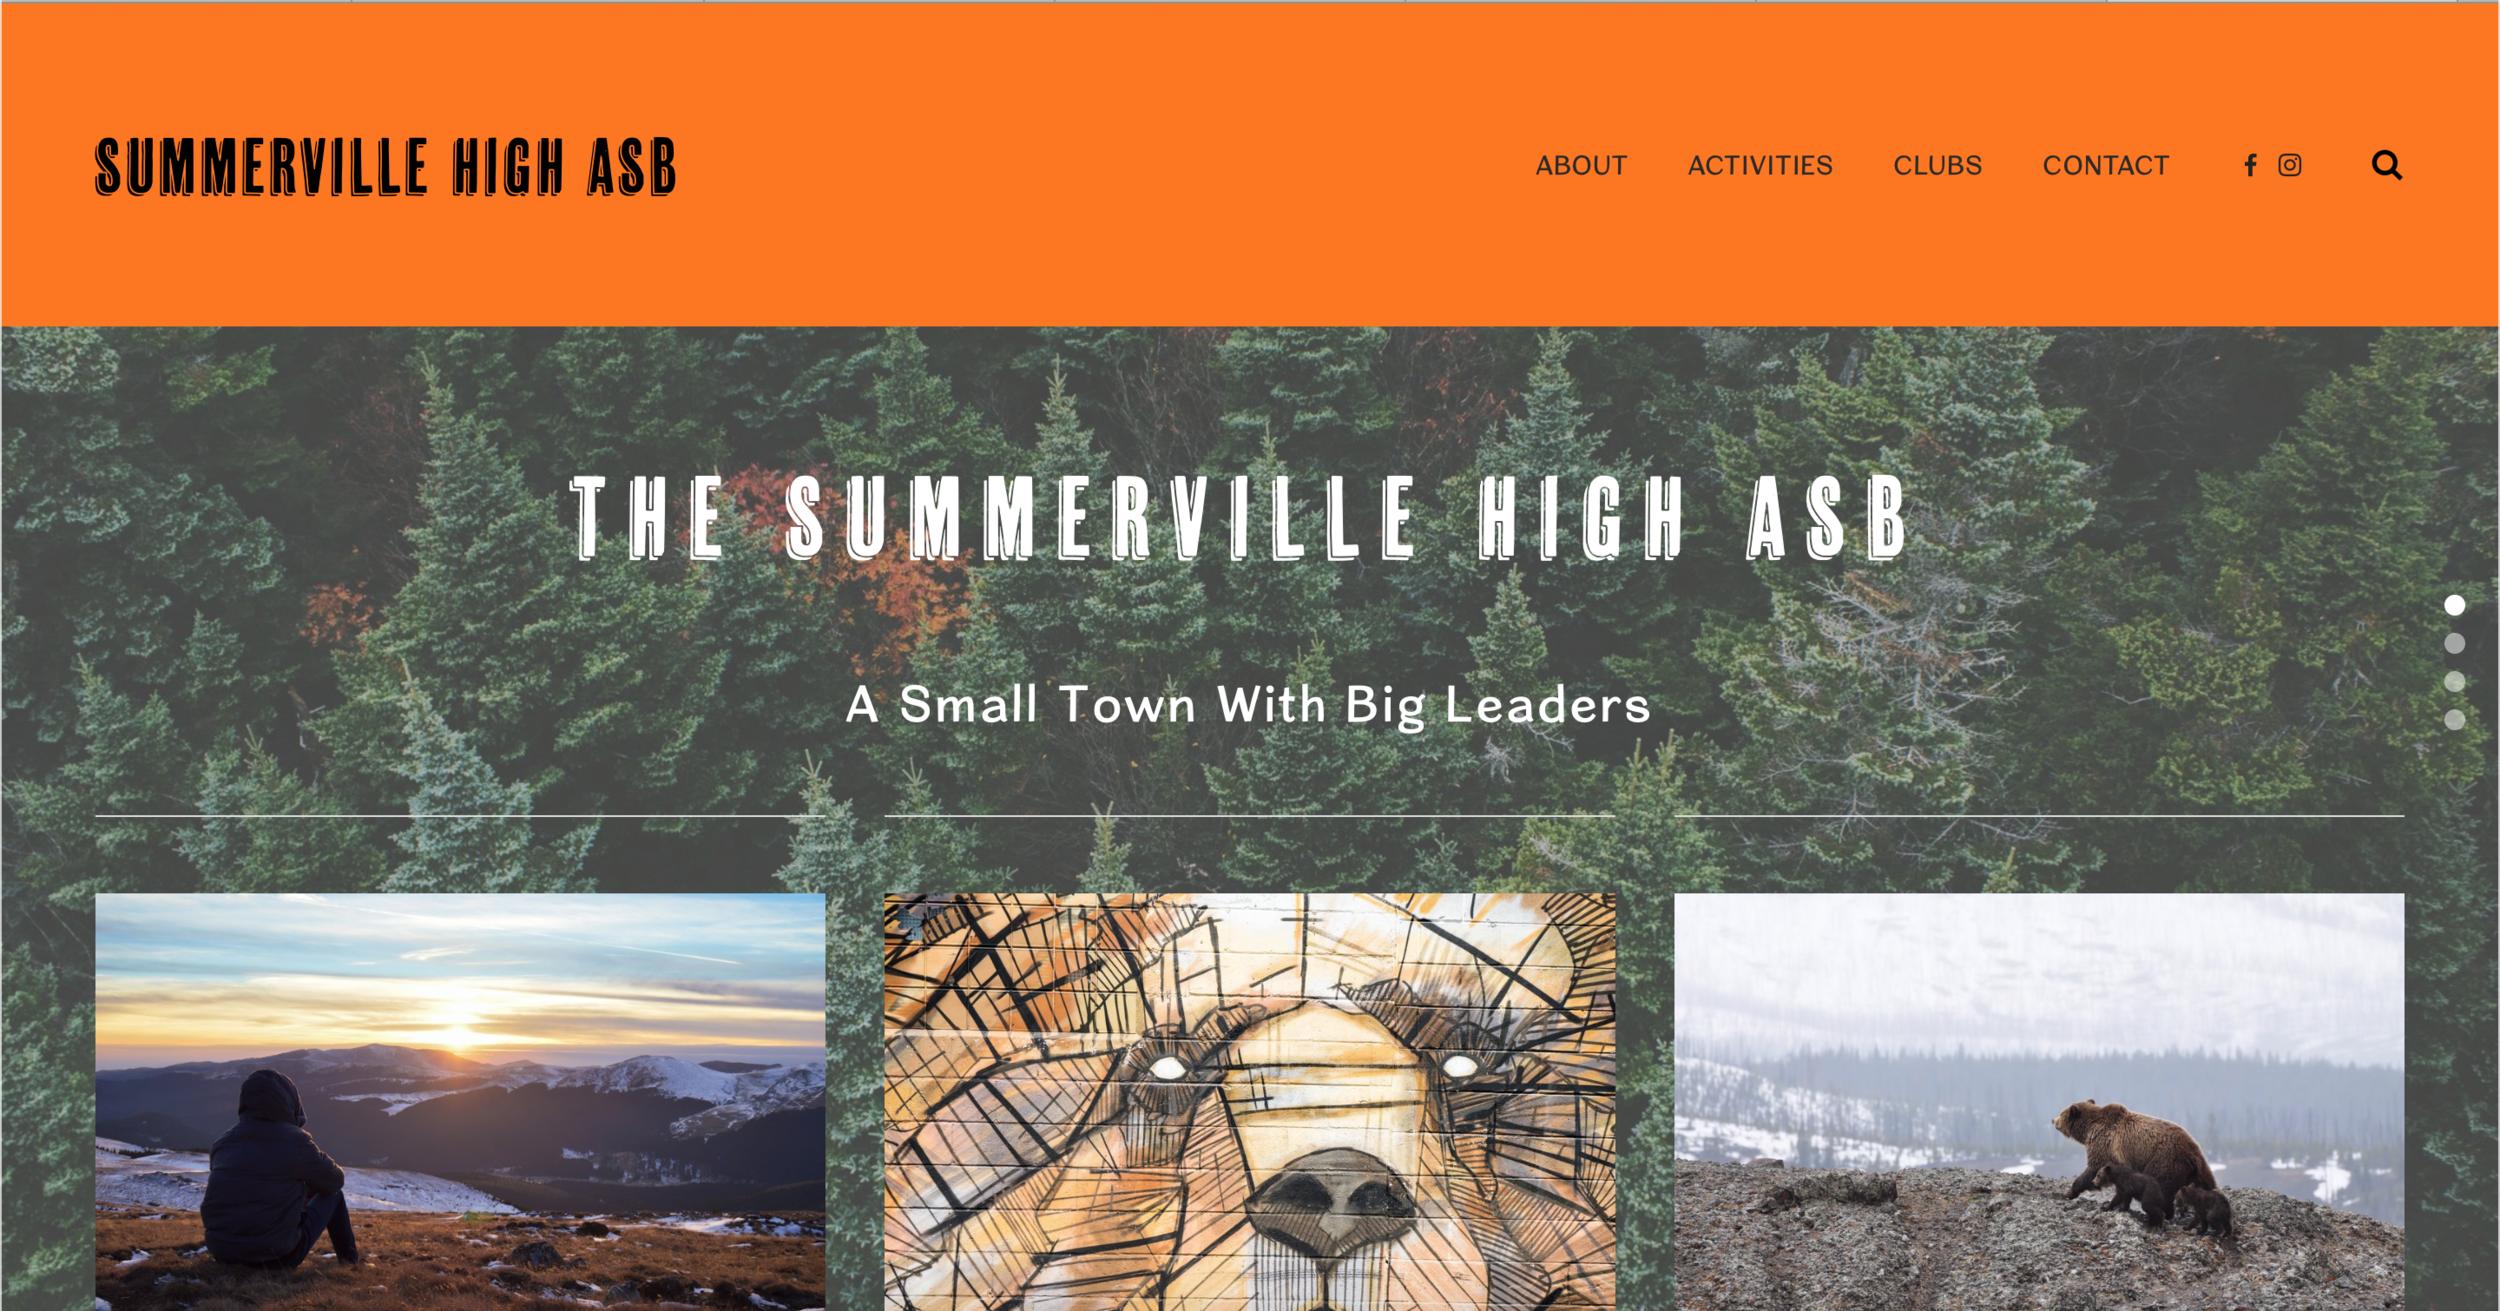 Summerville High ASB - Organization WebsiteClick Here to View